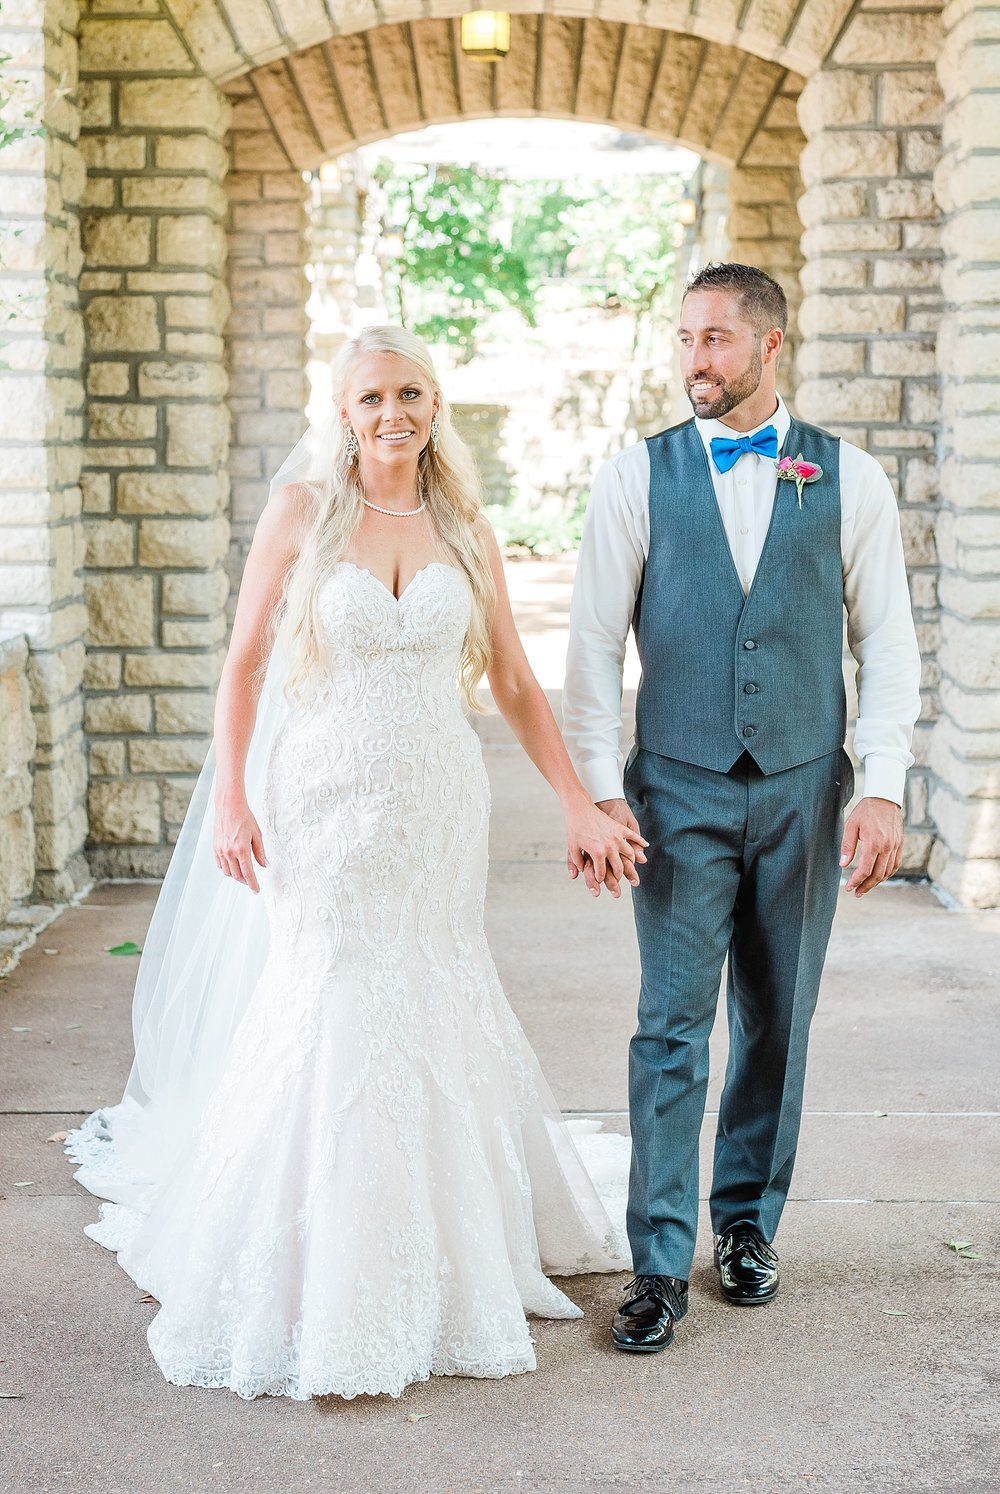 Alan and Heather Horn Wedding by Kelsi Kliethermes Photography Associate - Rachel_0043.jpg